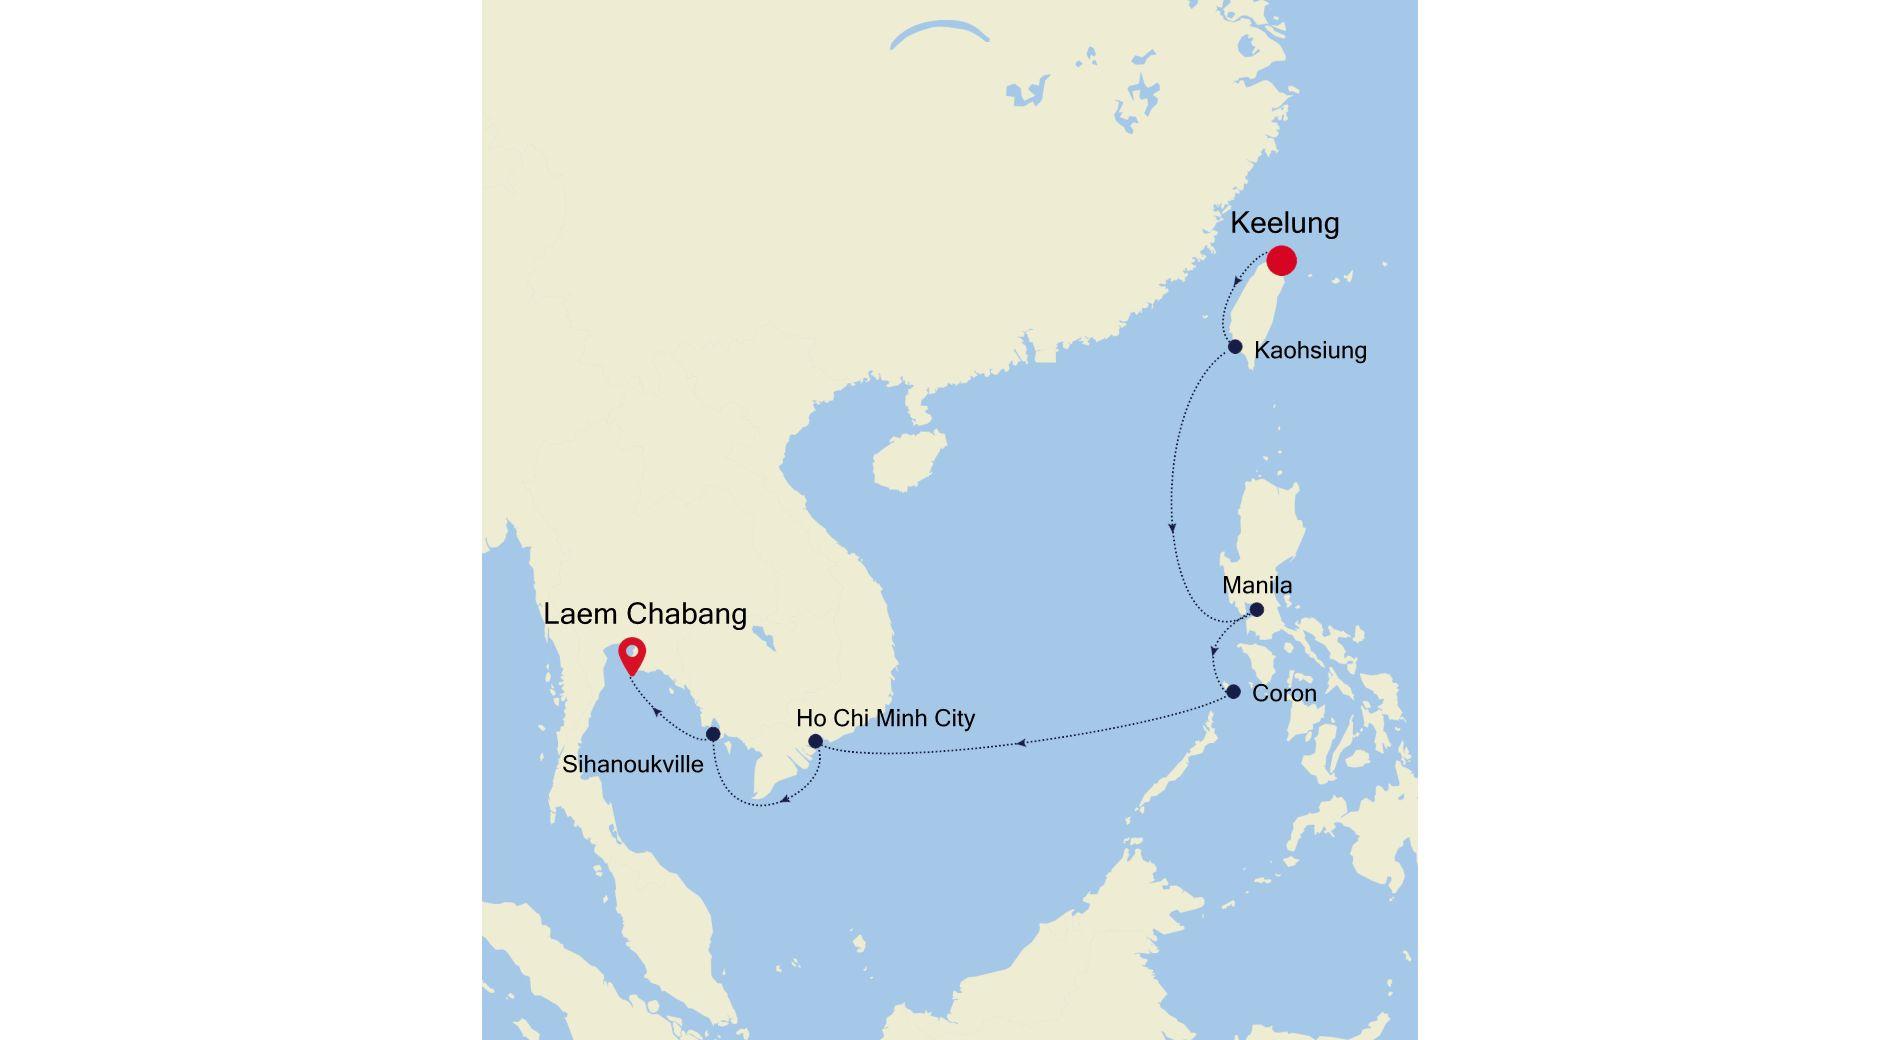 5002D - Keelung to Laem Chabang